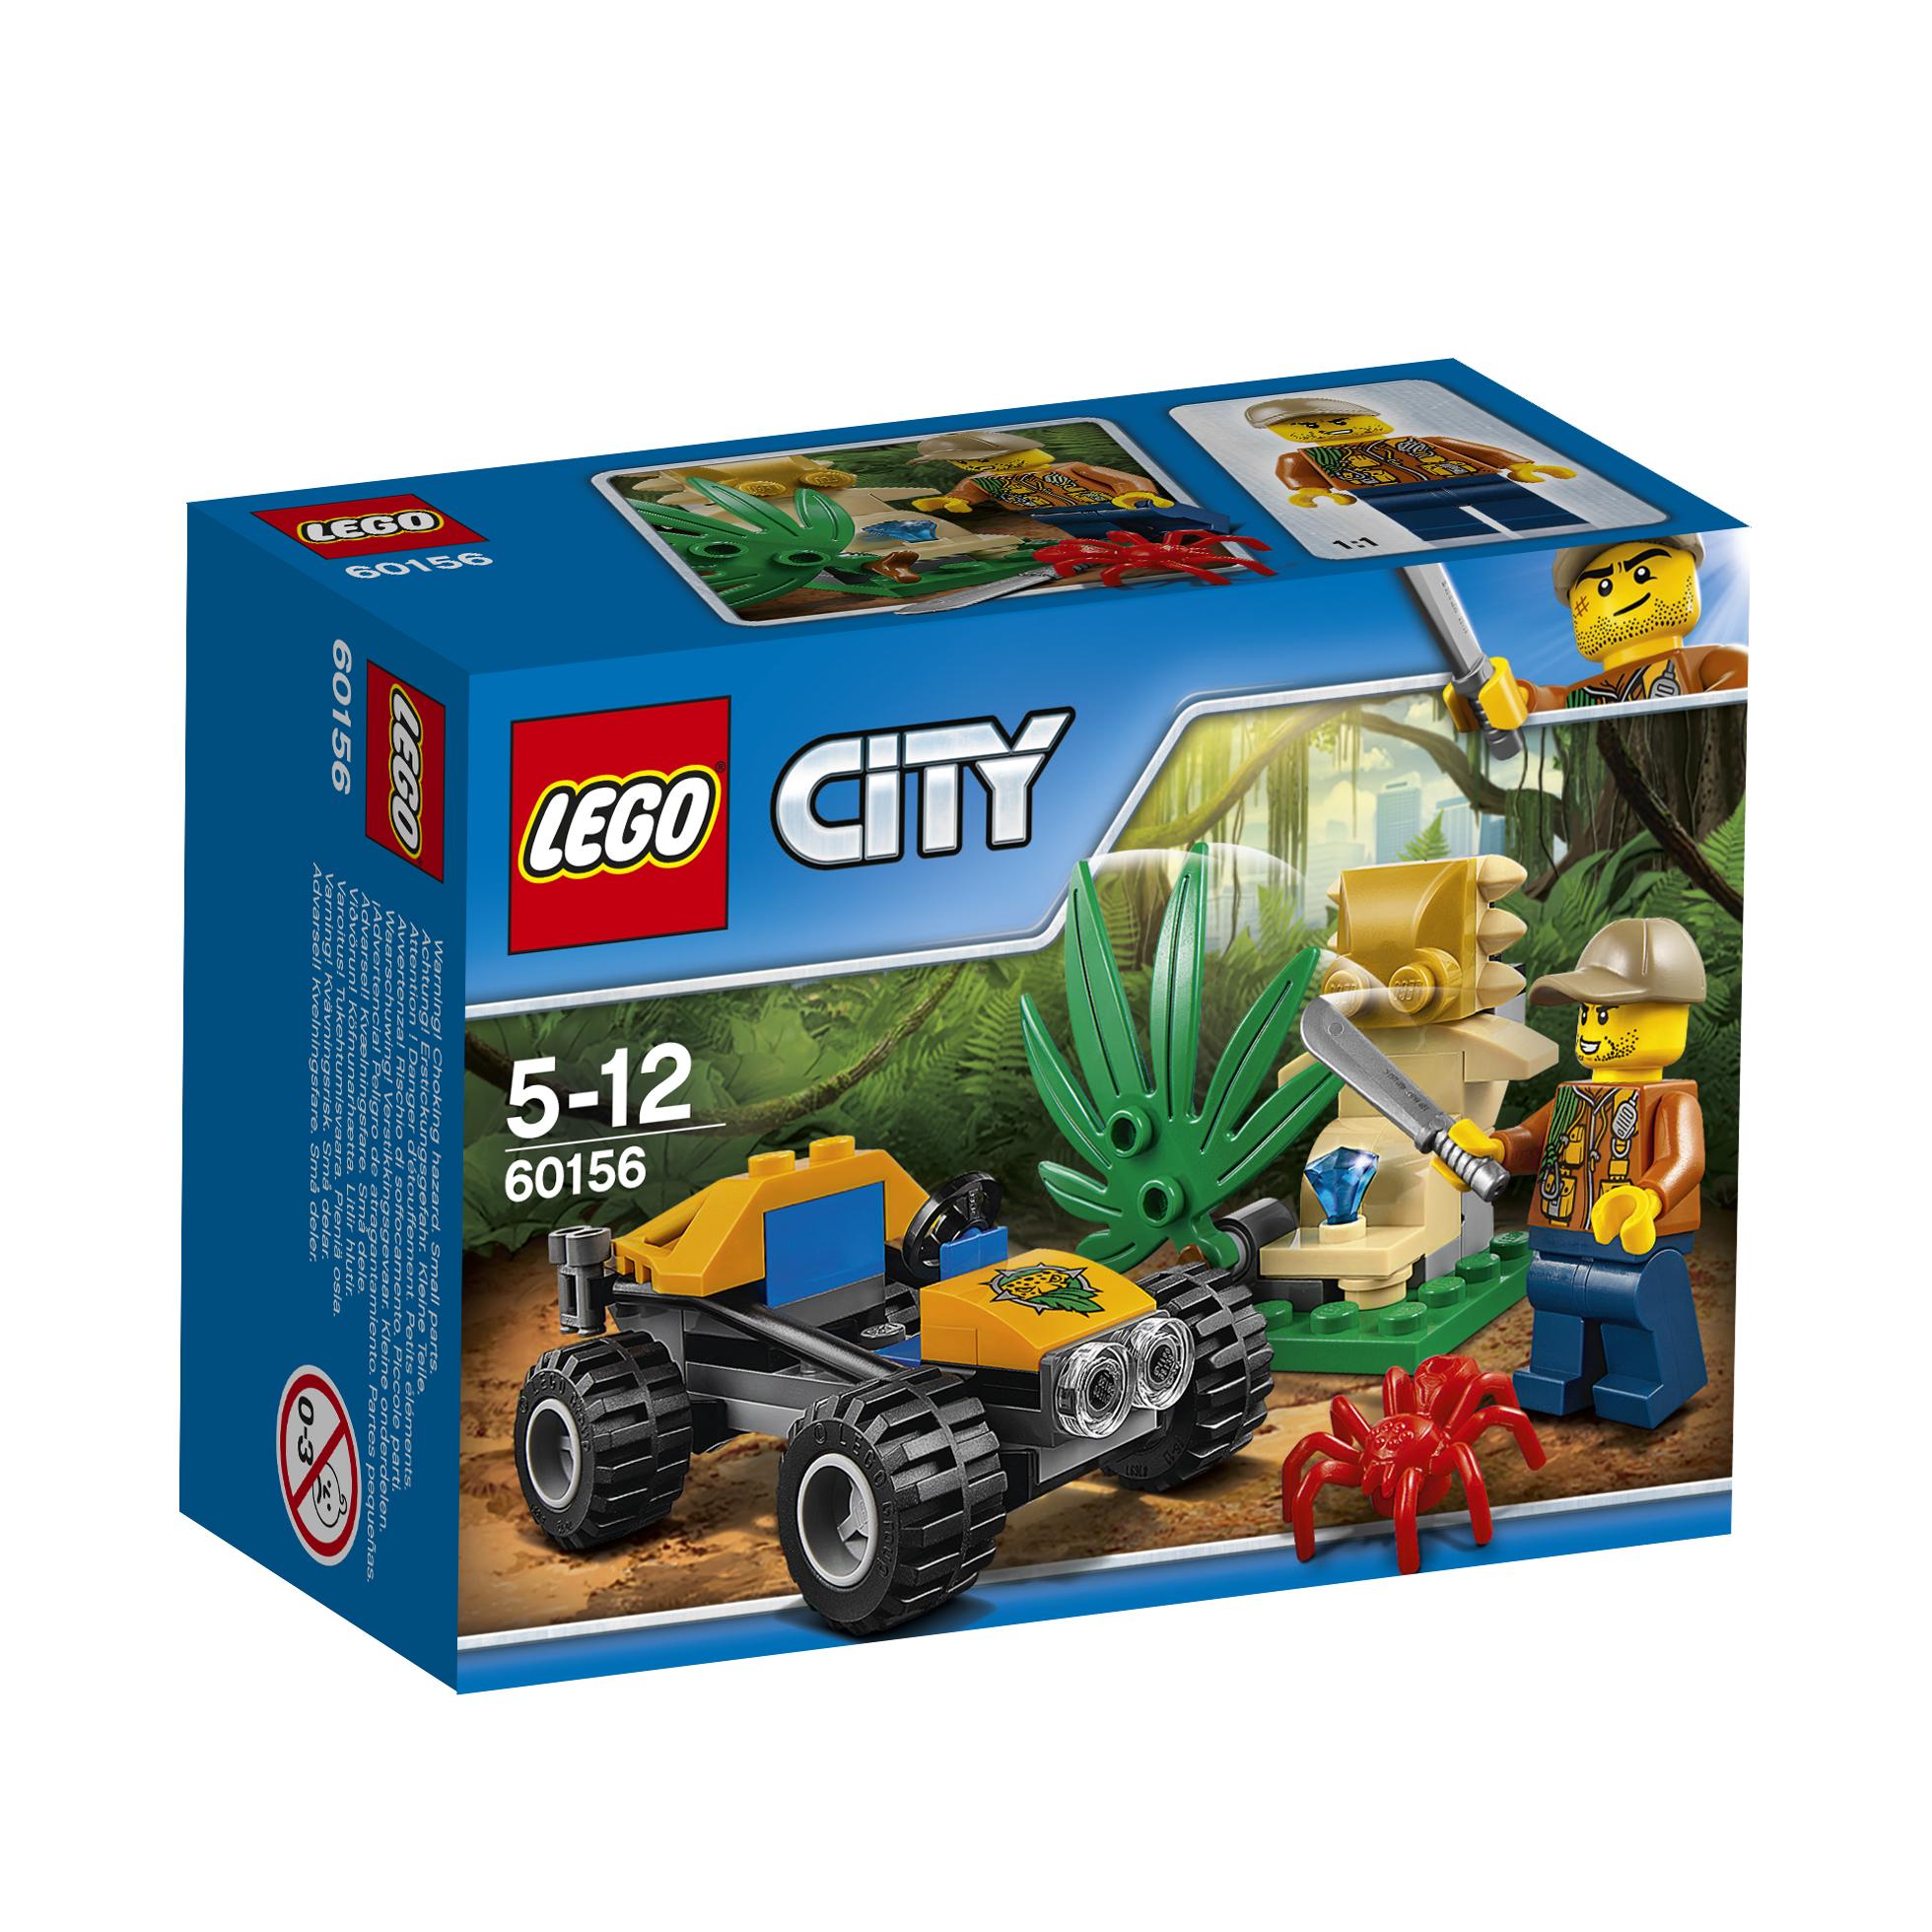 Link a LEGO_CITY_Jungle_60156_Box1